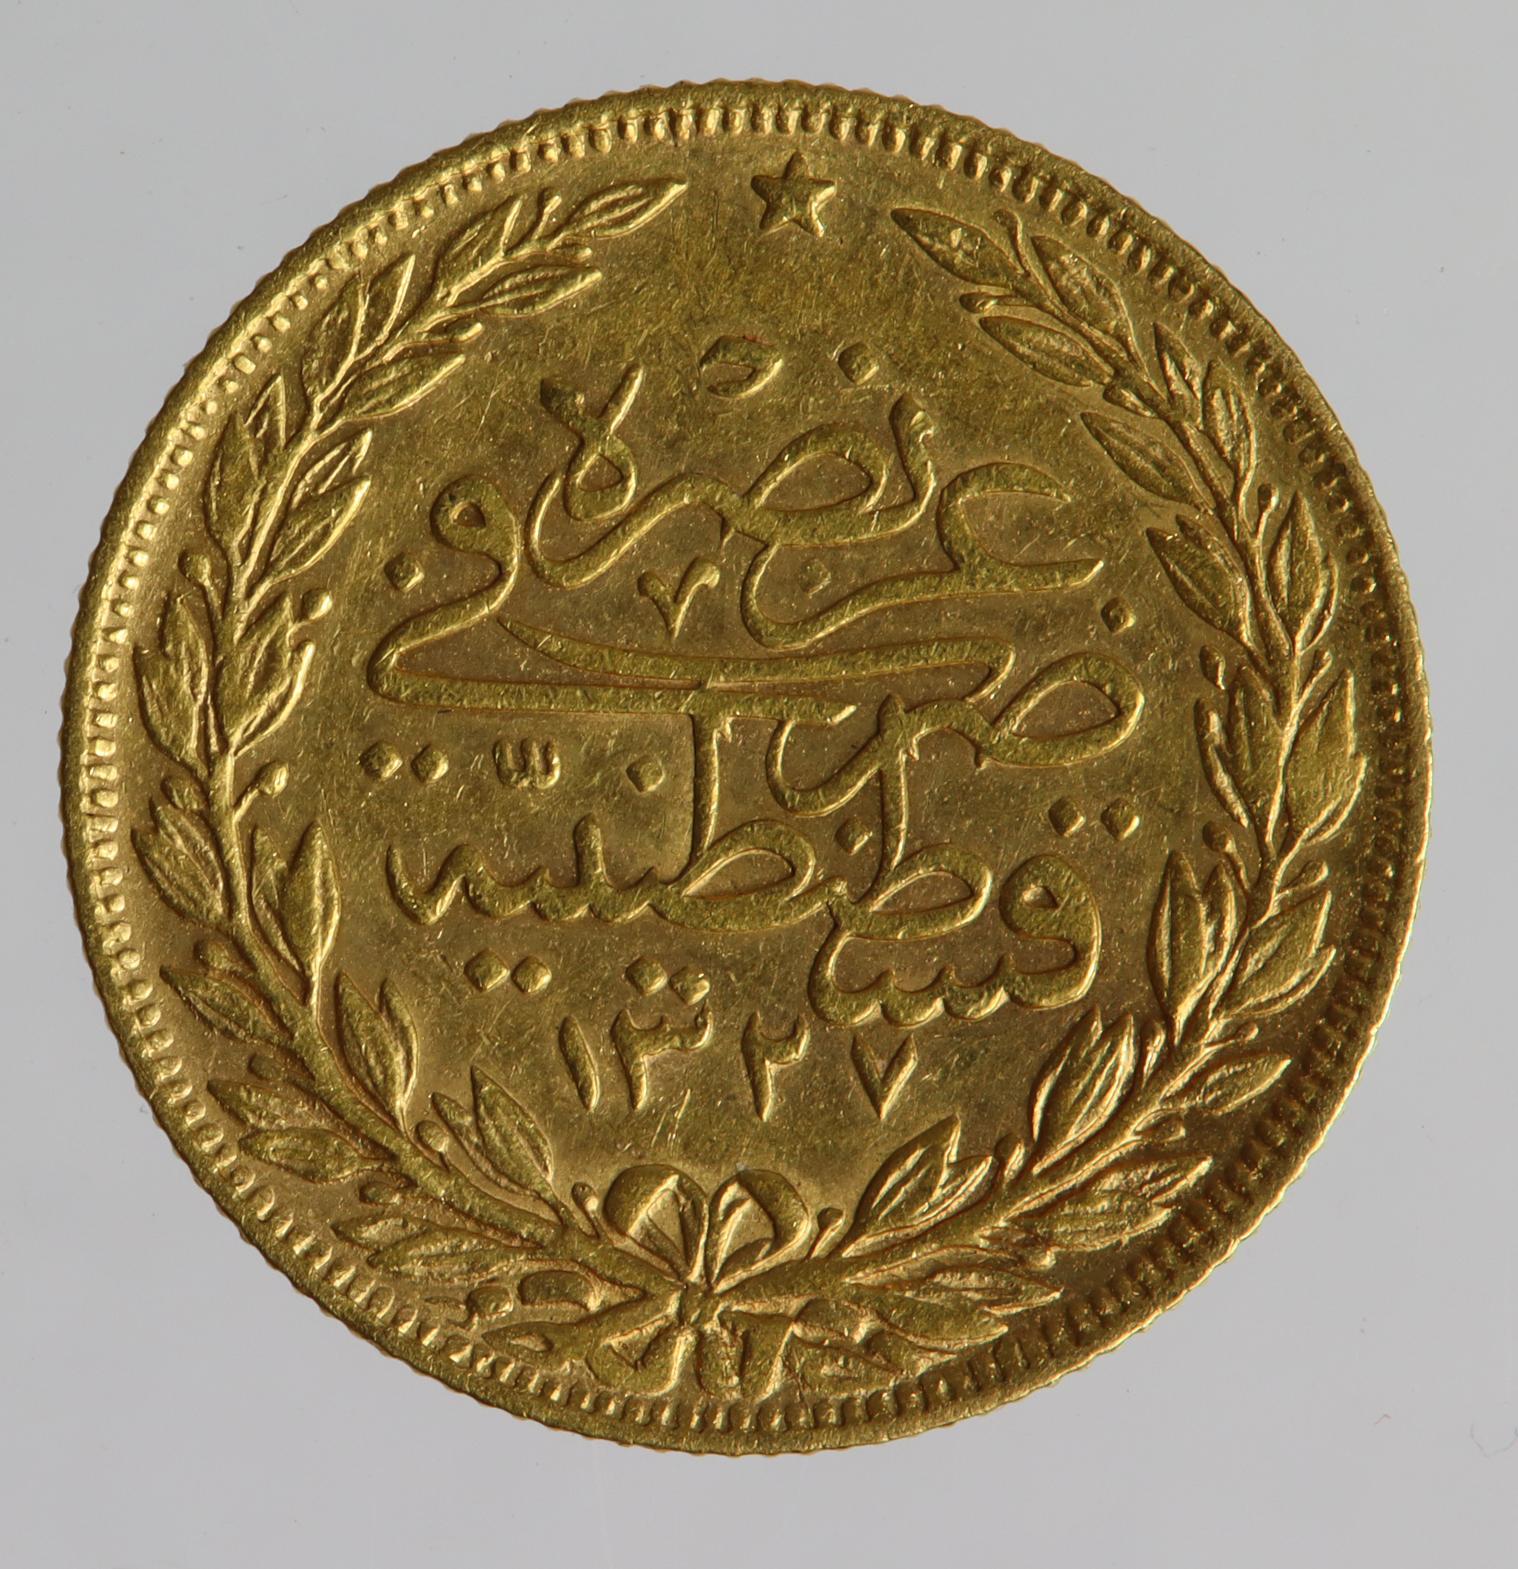 Turkey gold 100 Kurush AH1327//9, GVF (0.2127 troy oz AGW) - Image 2 of 2